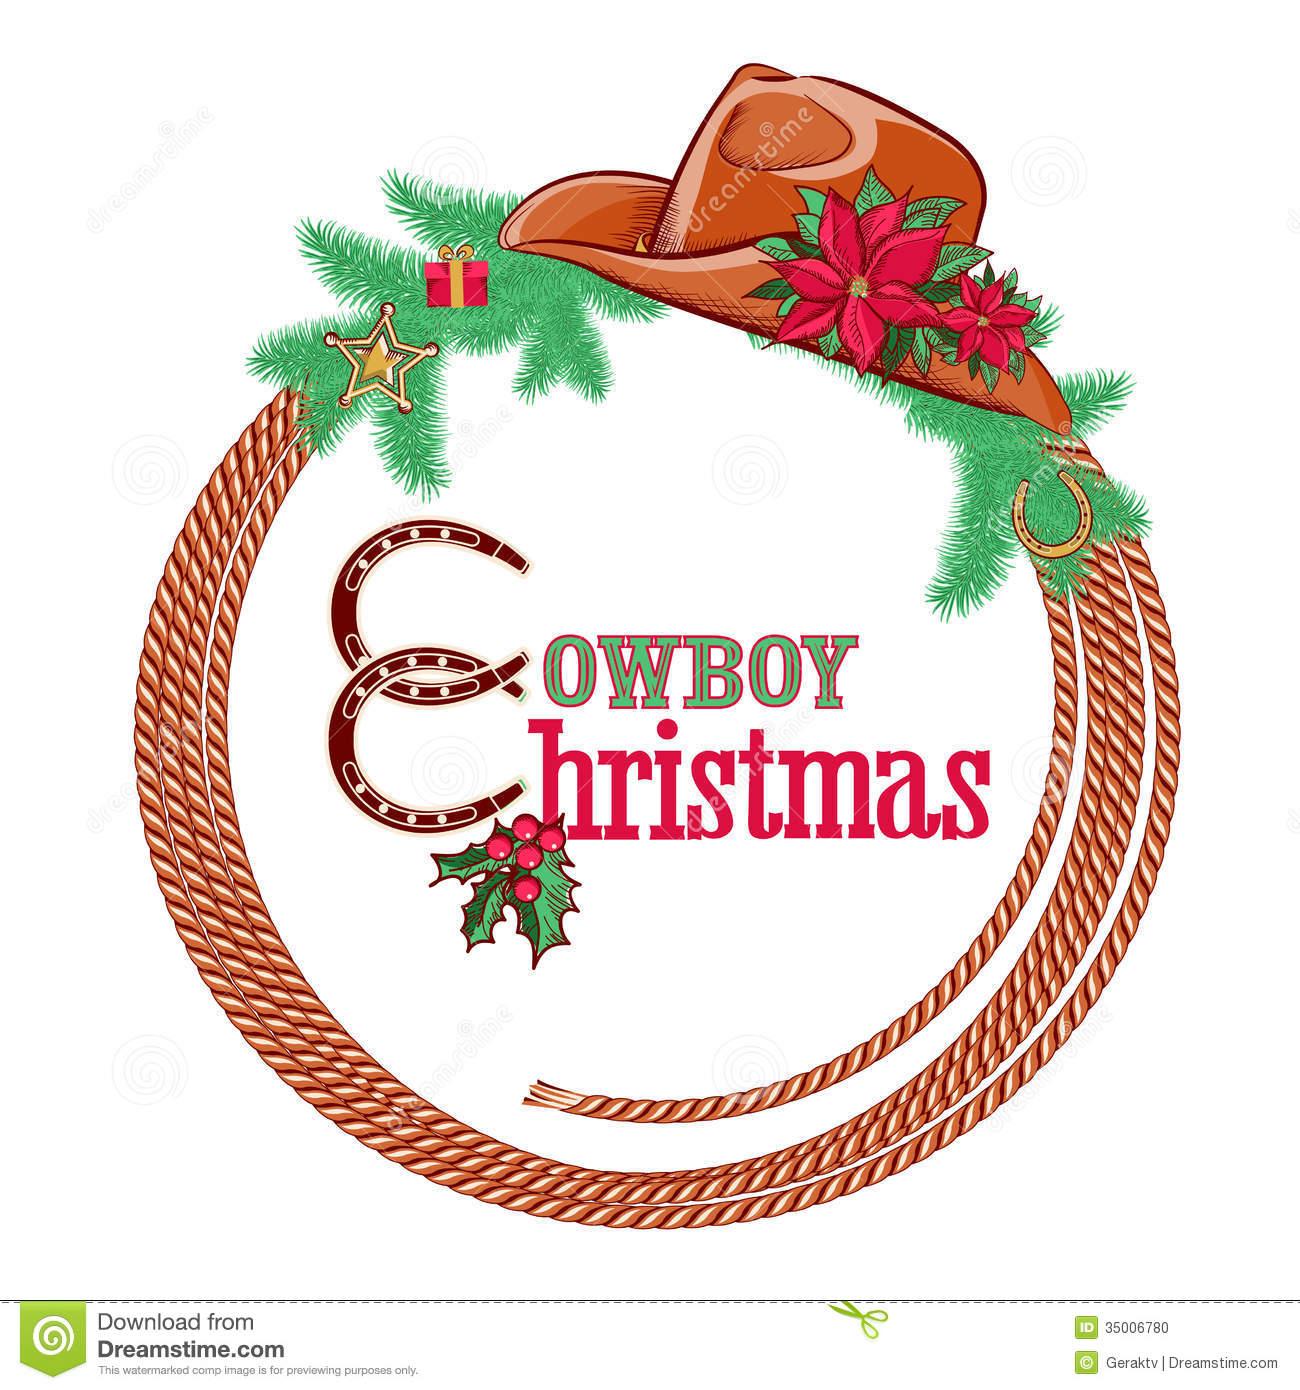 Cowboy clipart christmas cowboy Christmas Cowboy Clipart